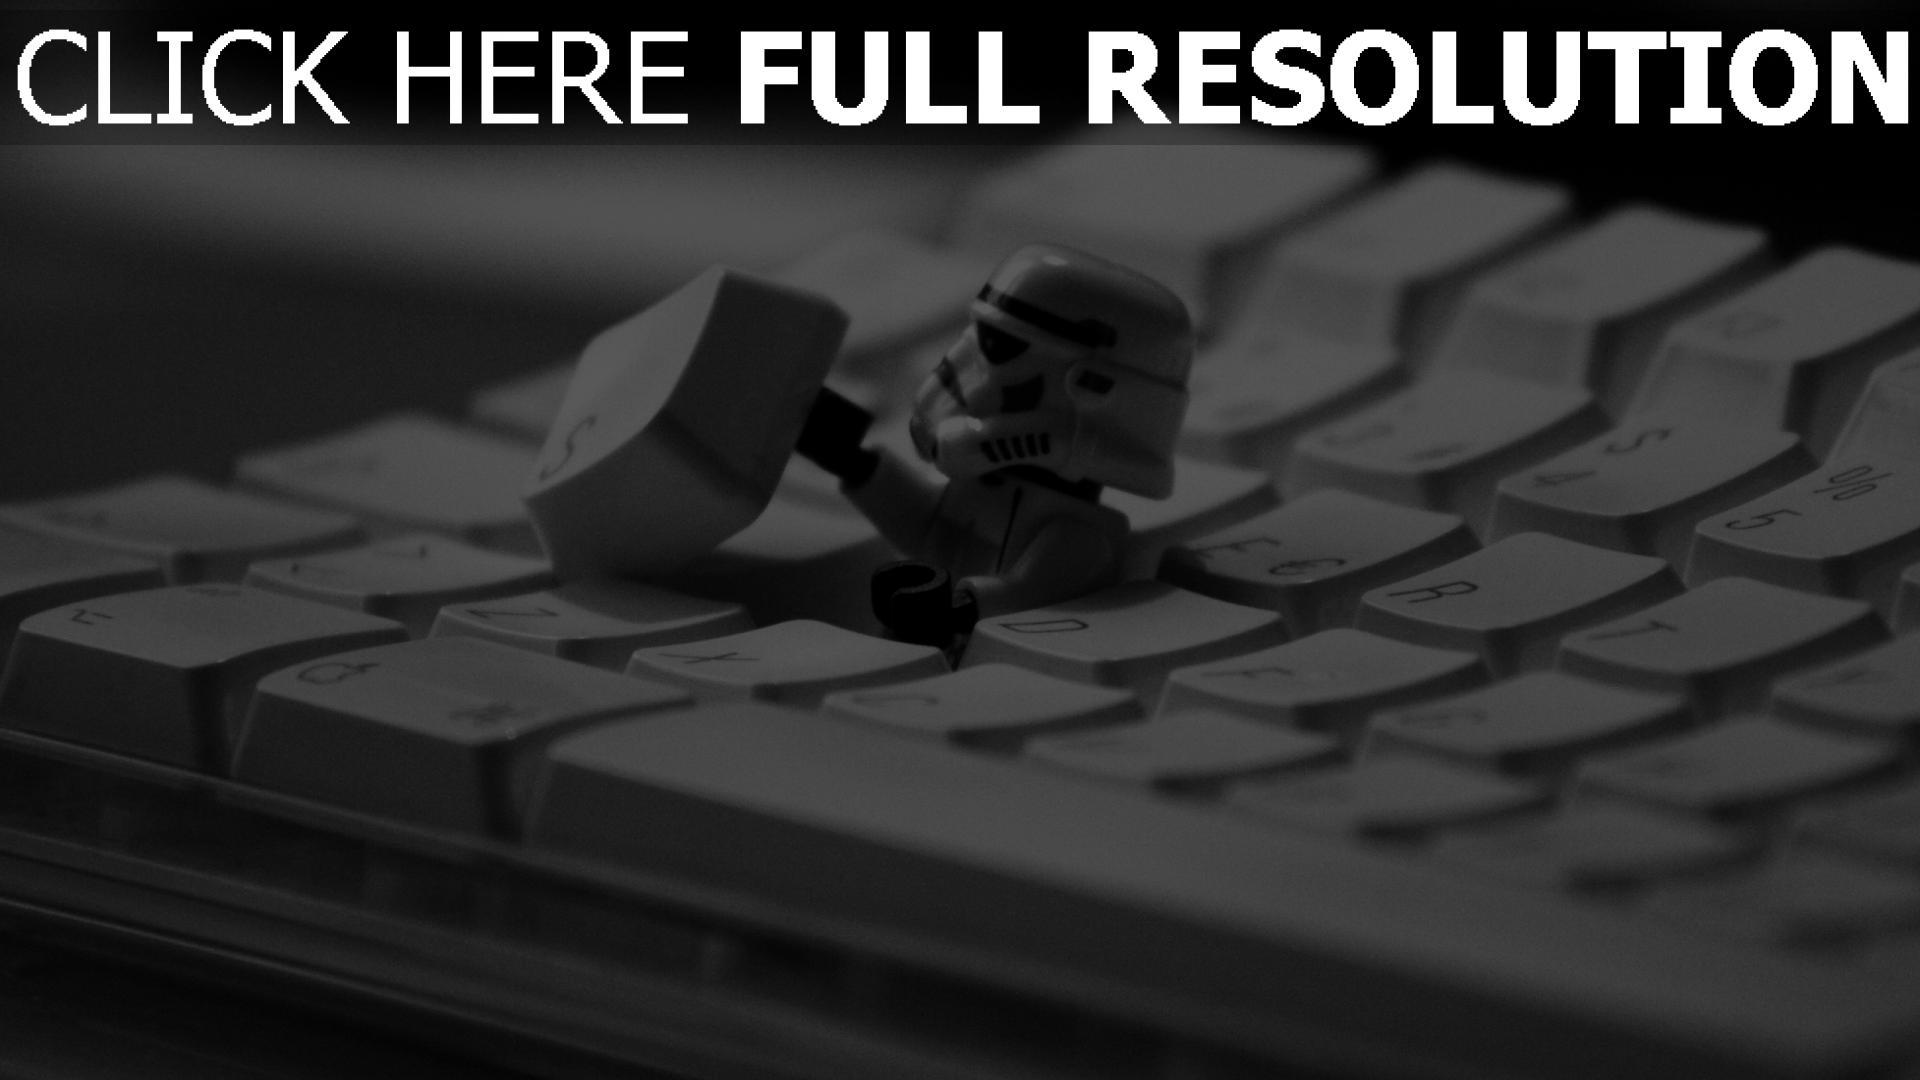 fond d'écran 1920x1080 clavier stormtrooper gros plan